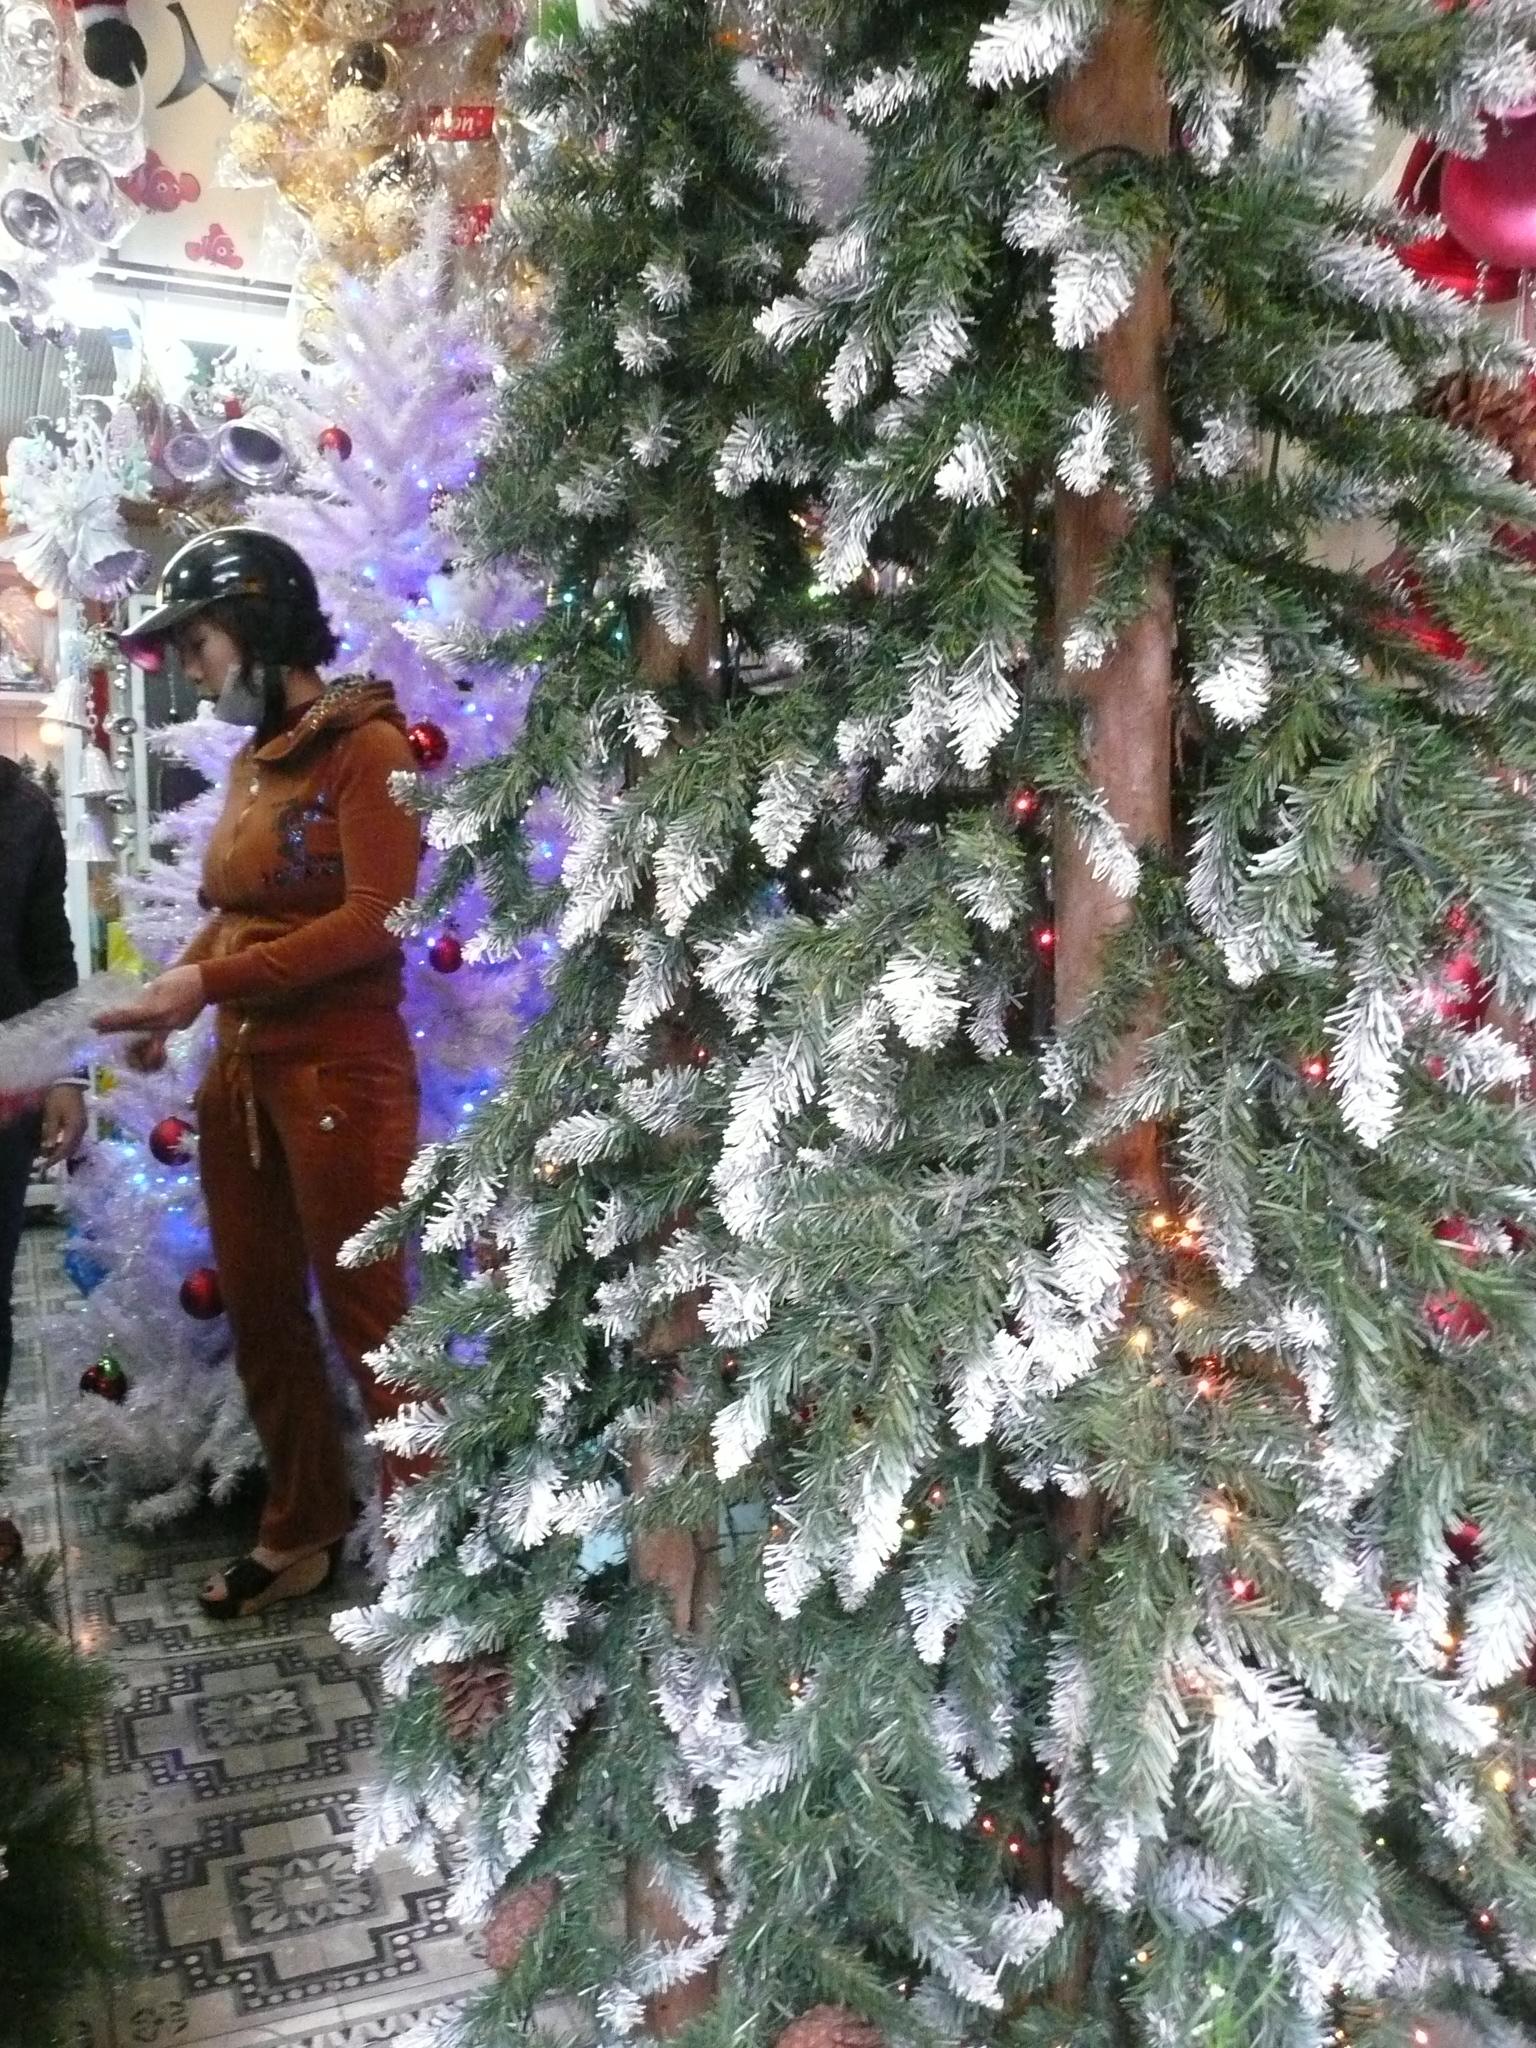 Thị trường Noel 2015